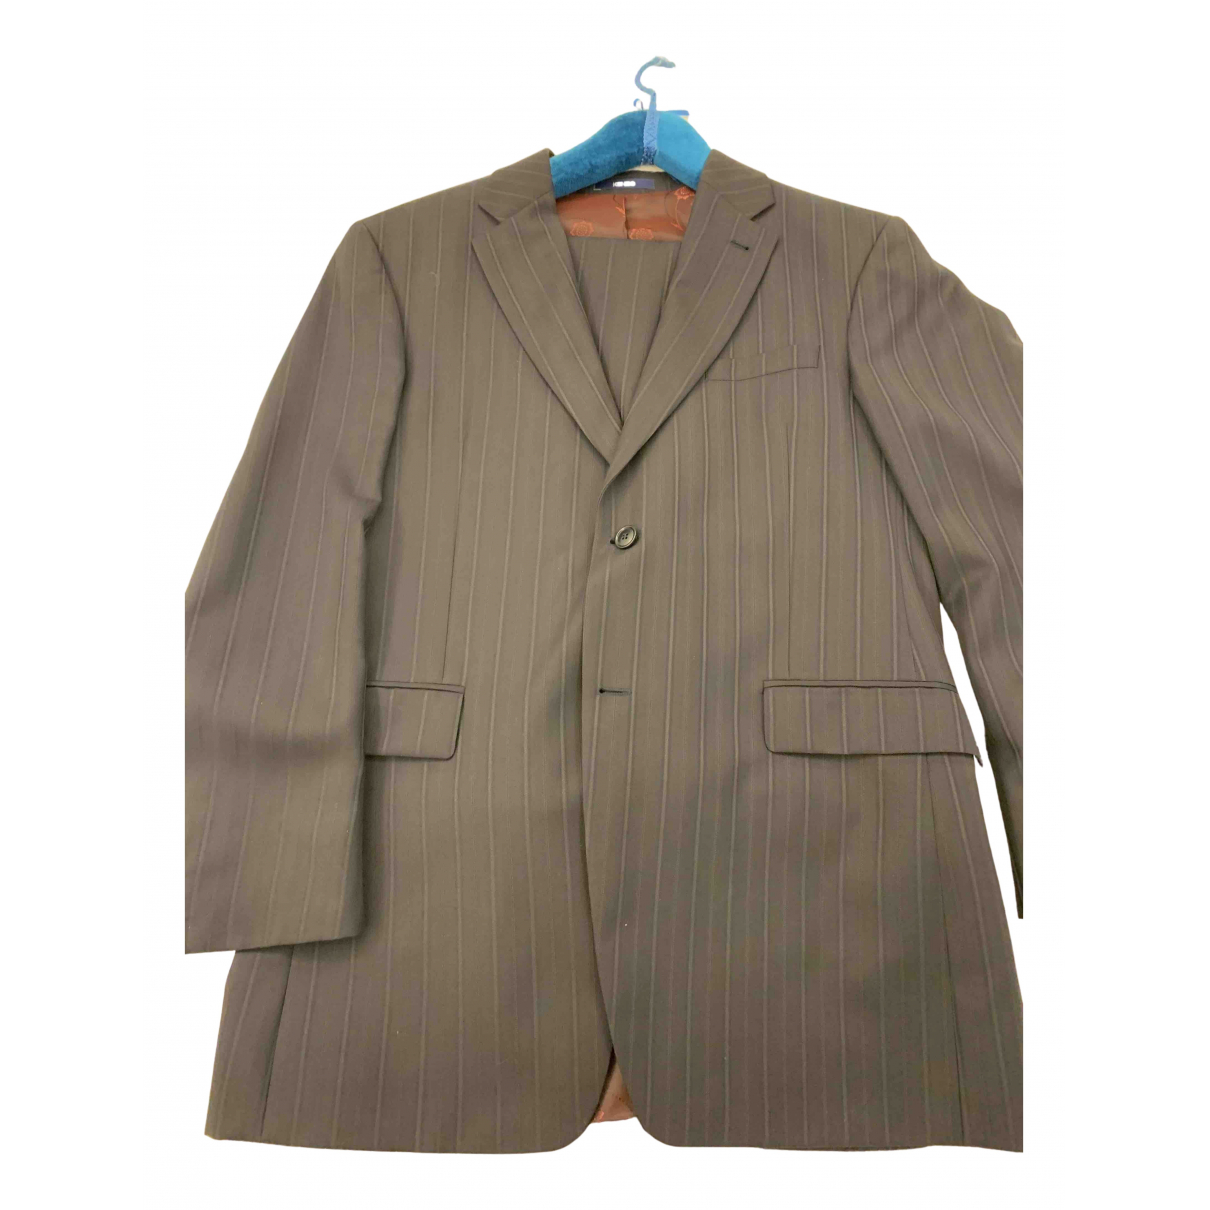 Kenzo N Blue Wool Suits for Men 54 FR